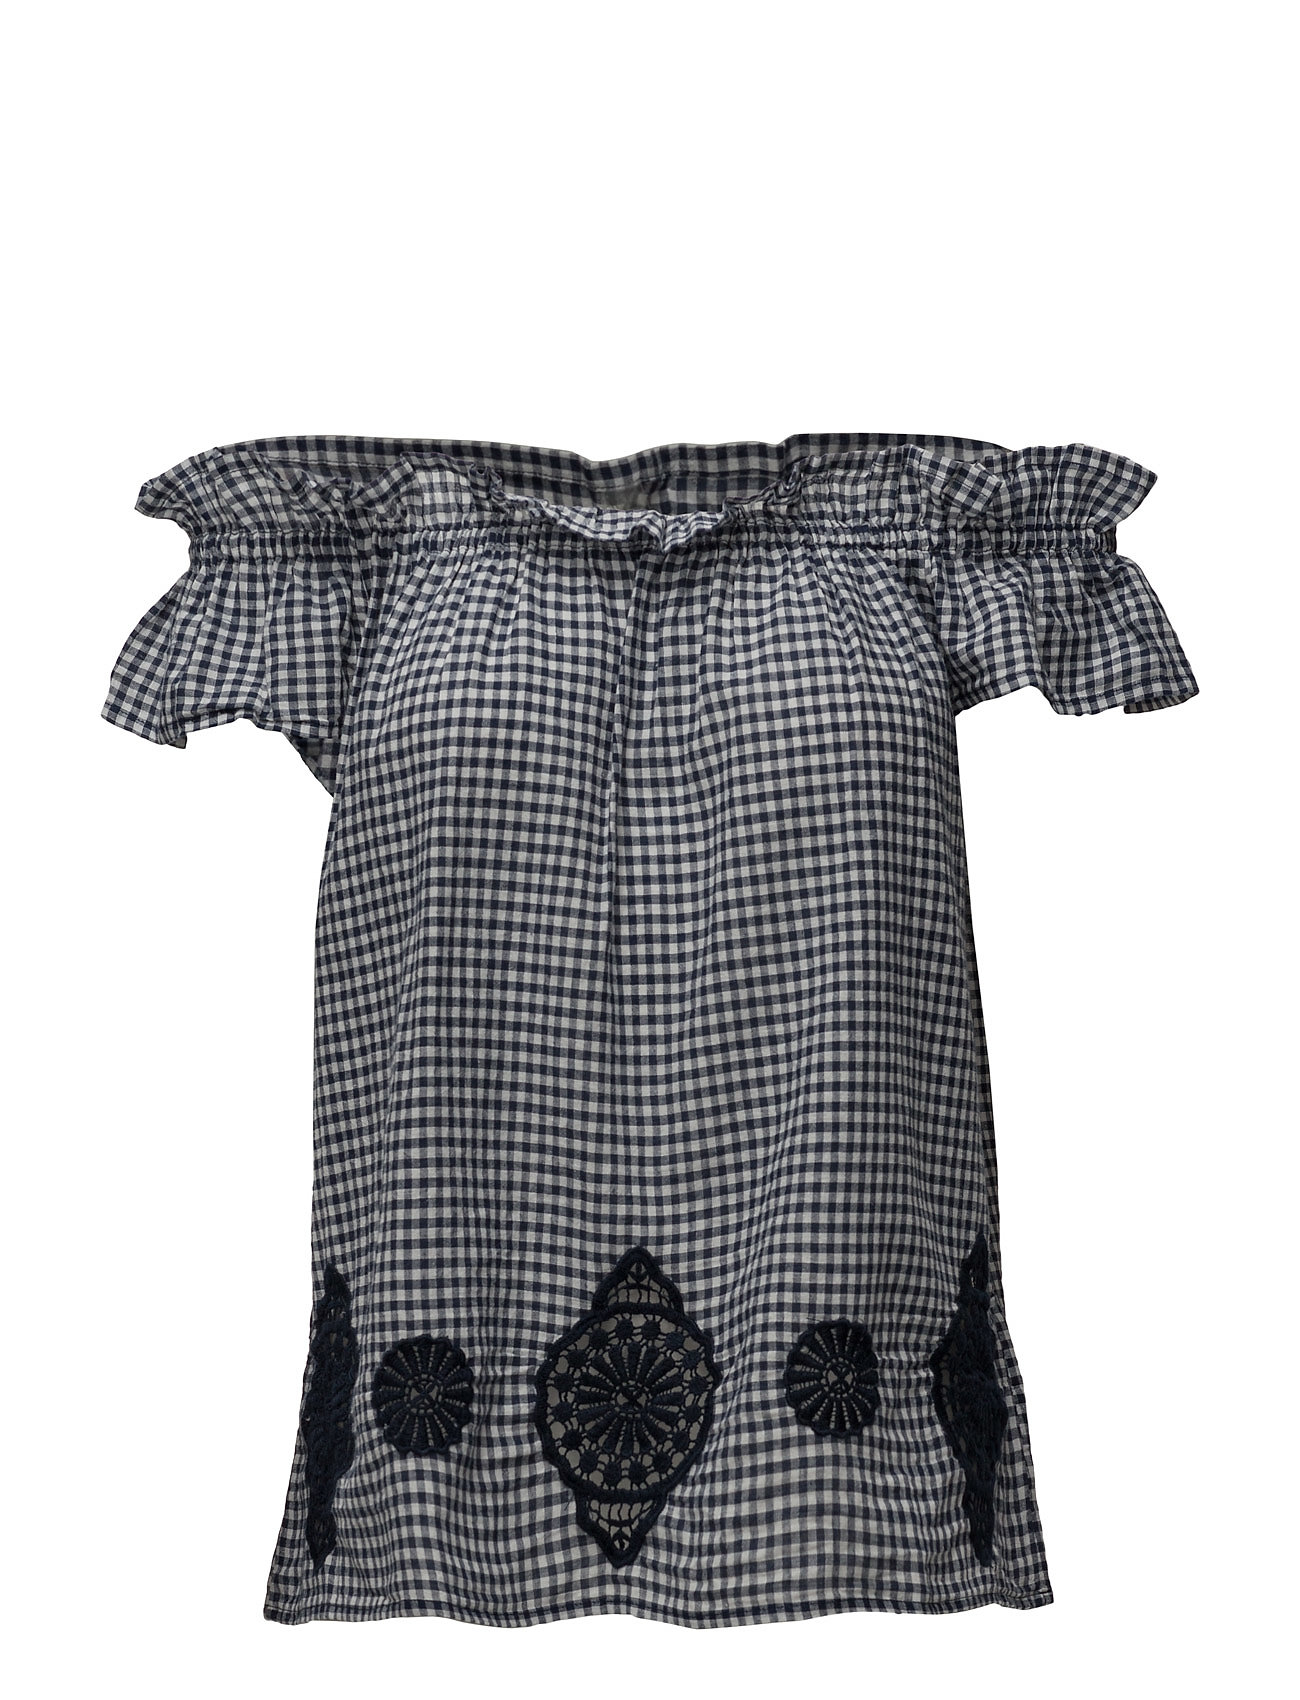 e60d38d6e6a1 Bestil Blouses Woven EDC by Esprit Kortærmede i Off White til Damer i en  online fashion store